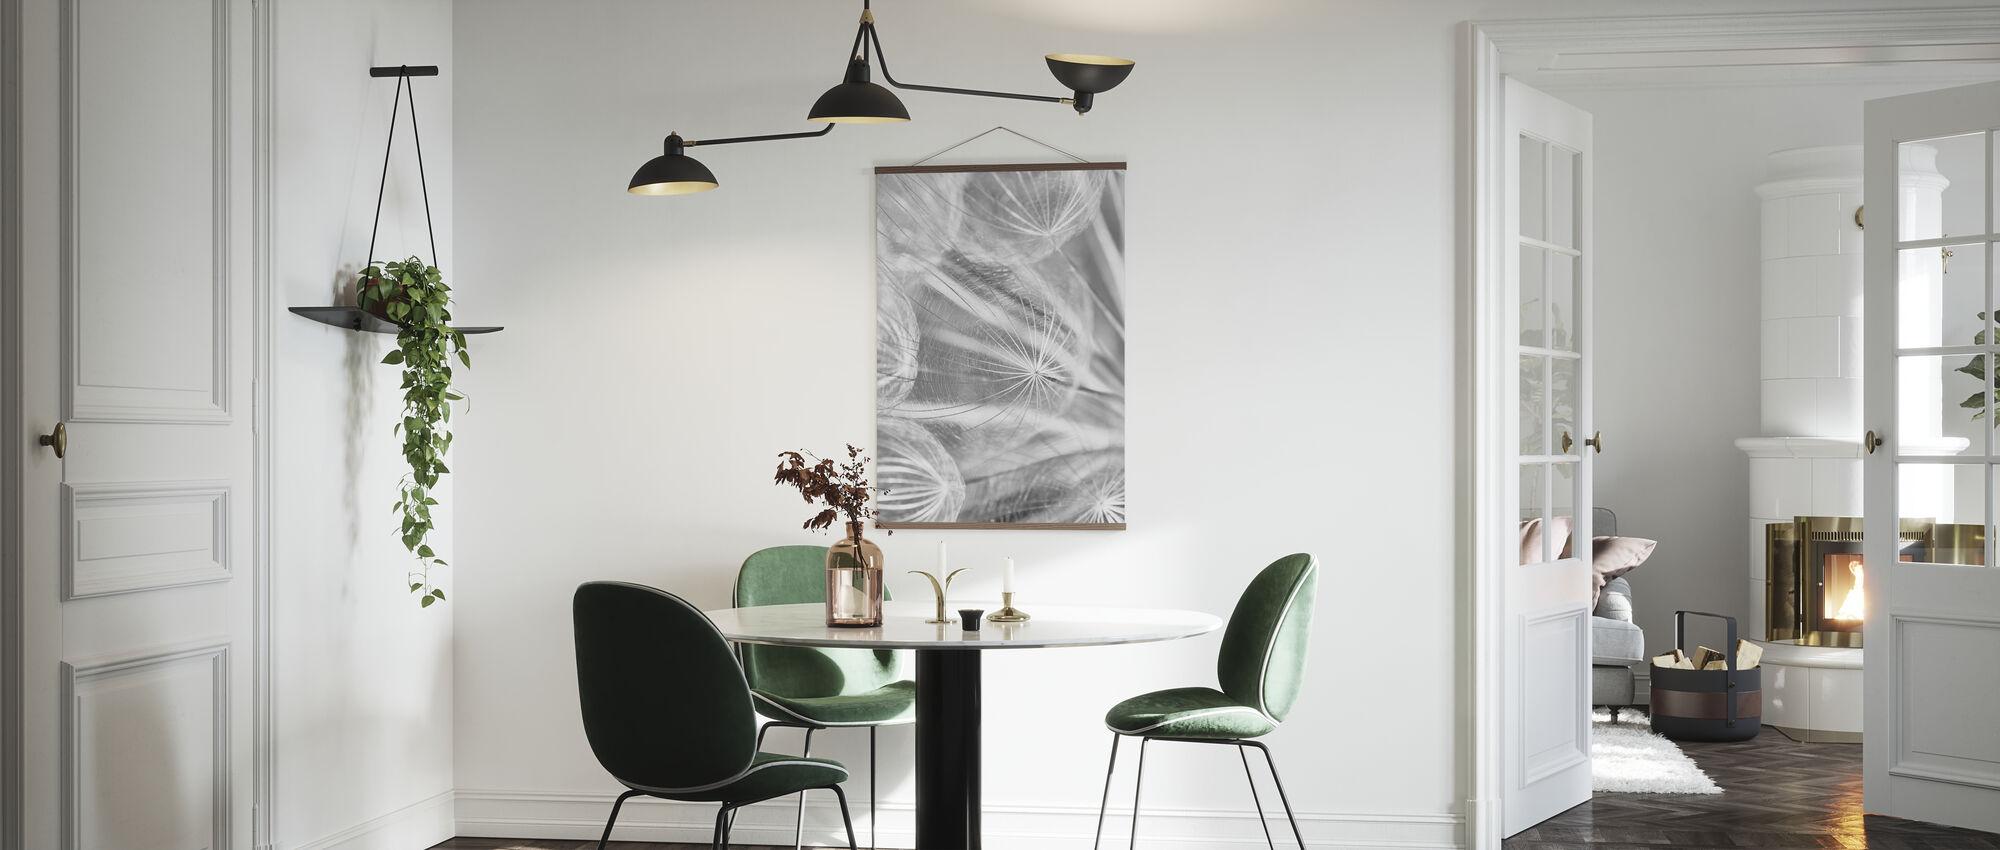 Light Verticle Dandy - Poster - Kitchen